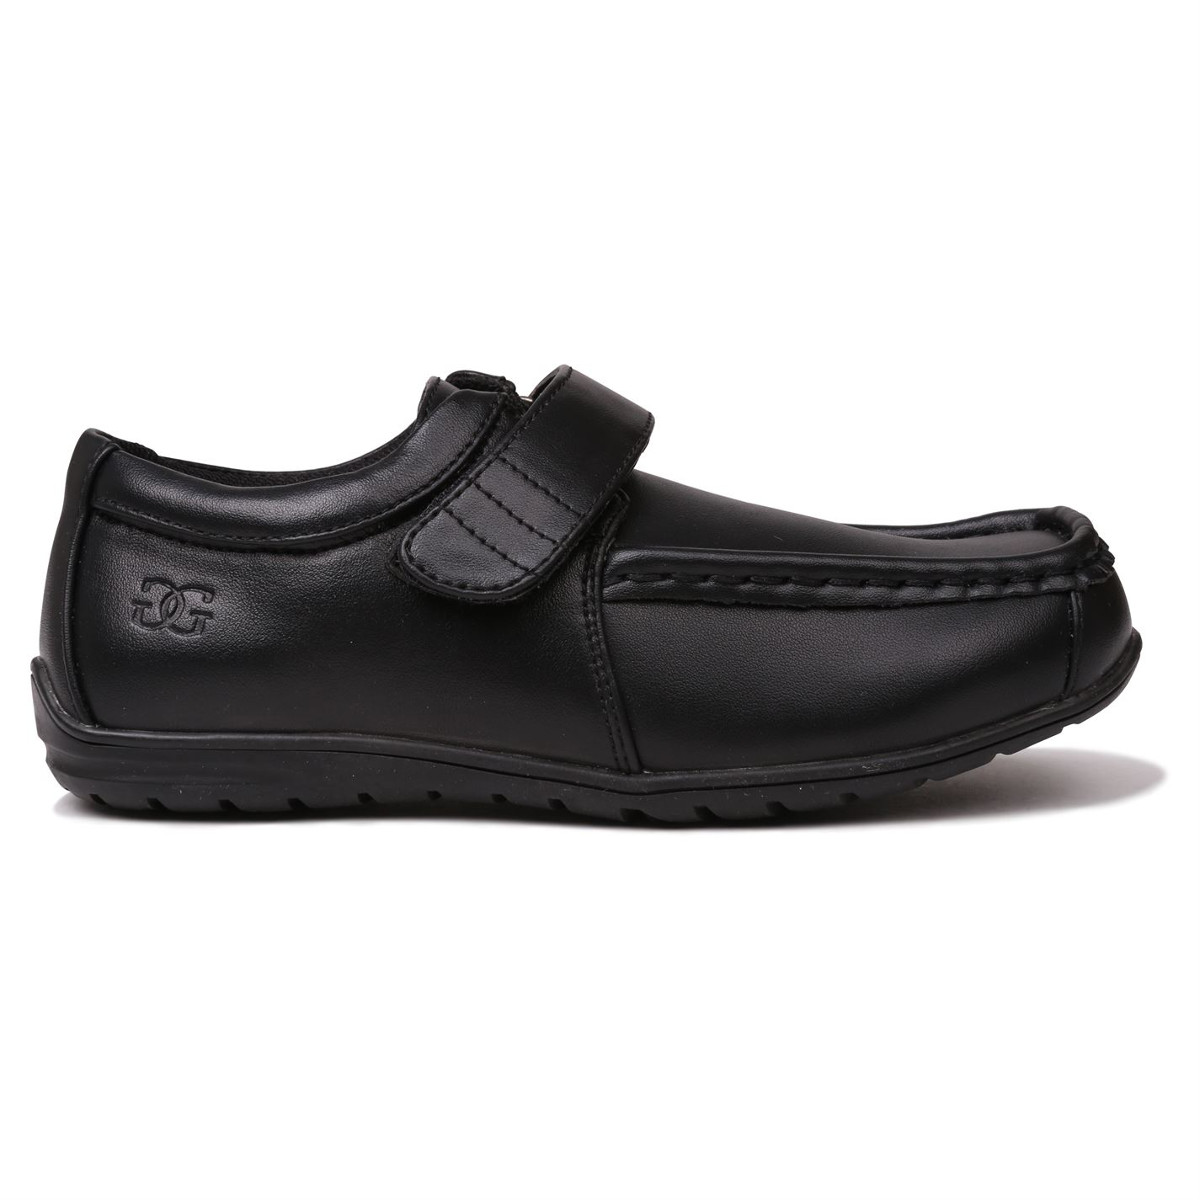 Giorgio Boys' Bexley Velcro Casual Shoes - Black, 6